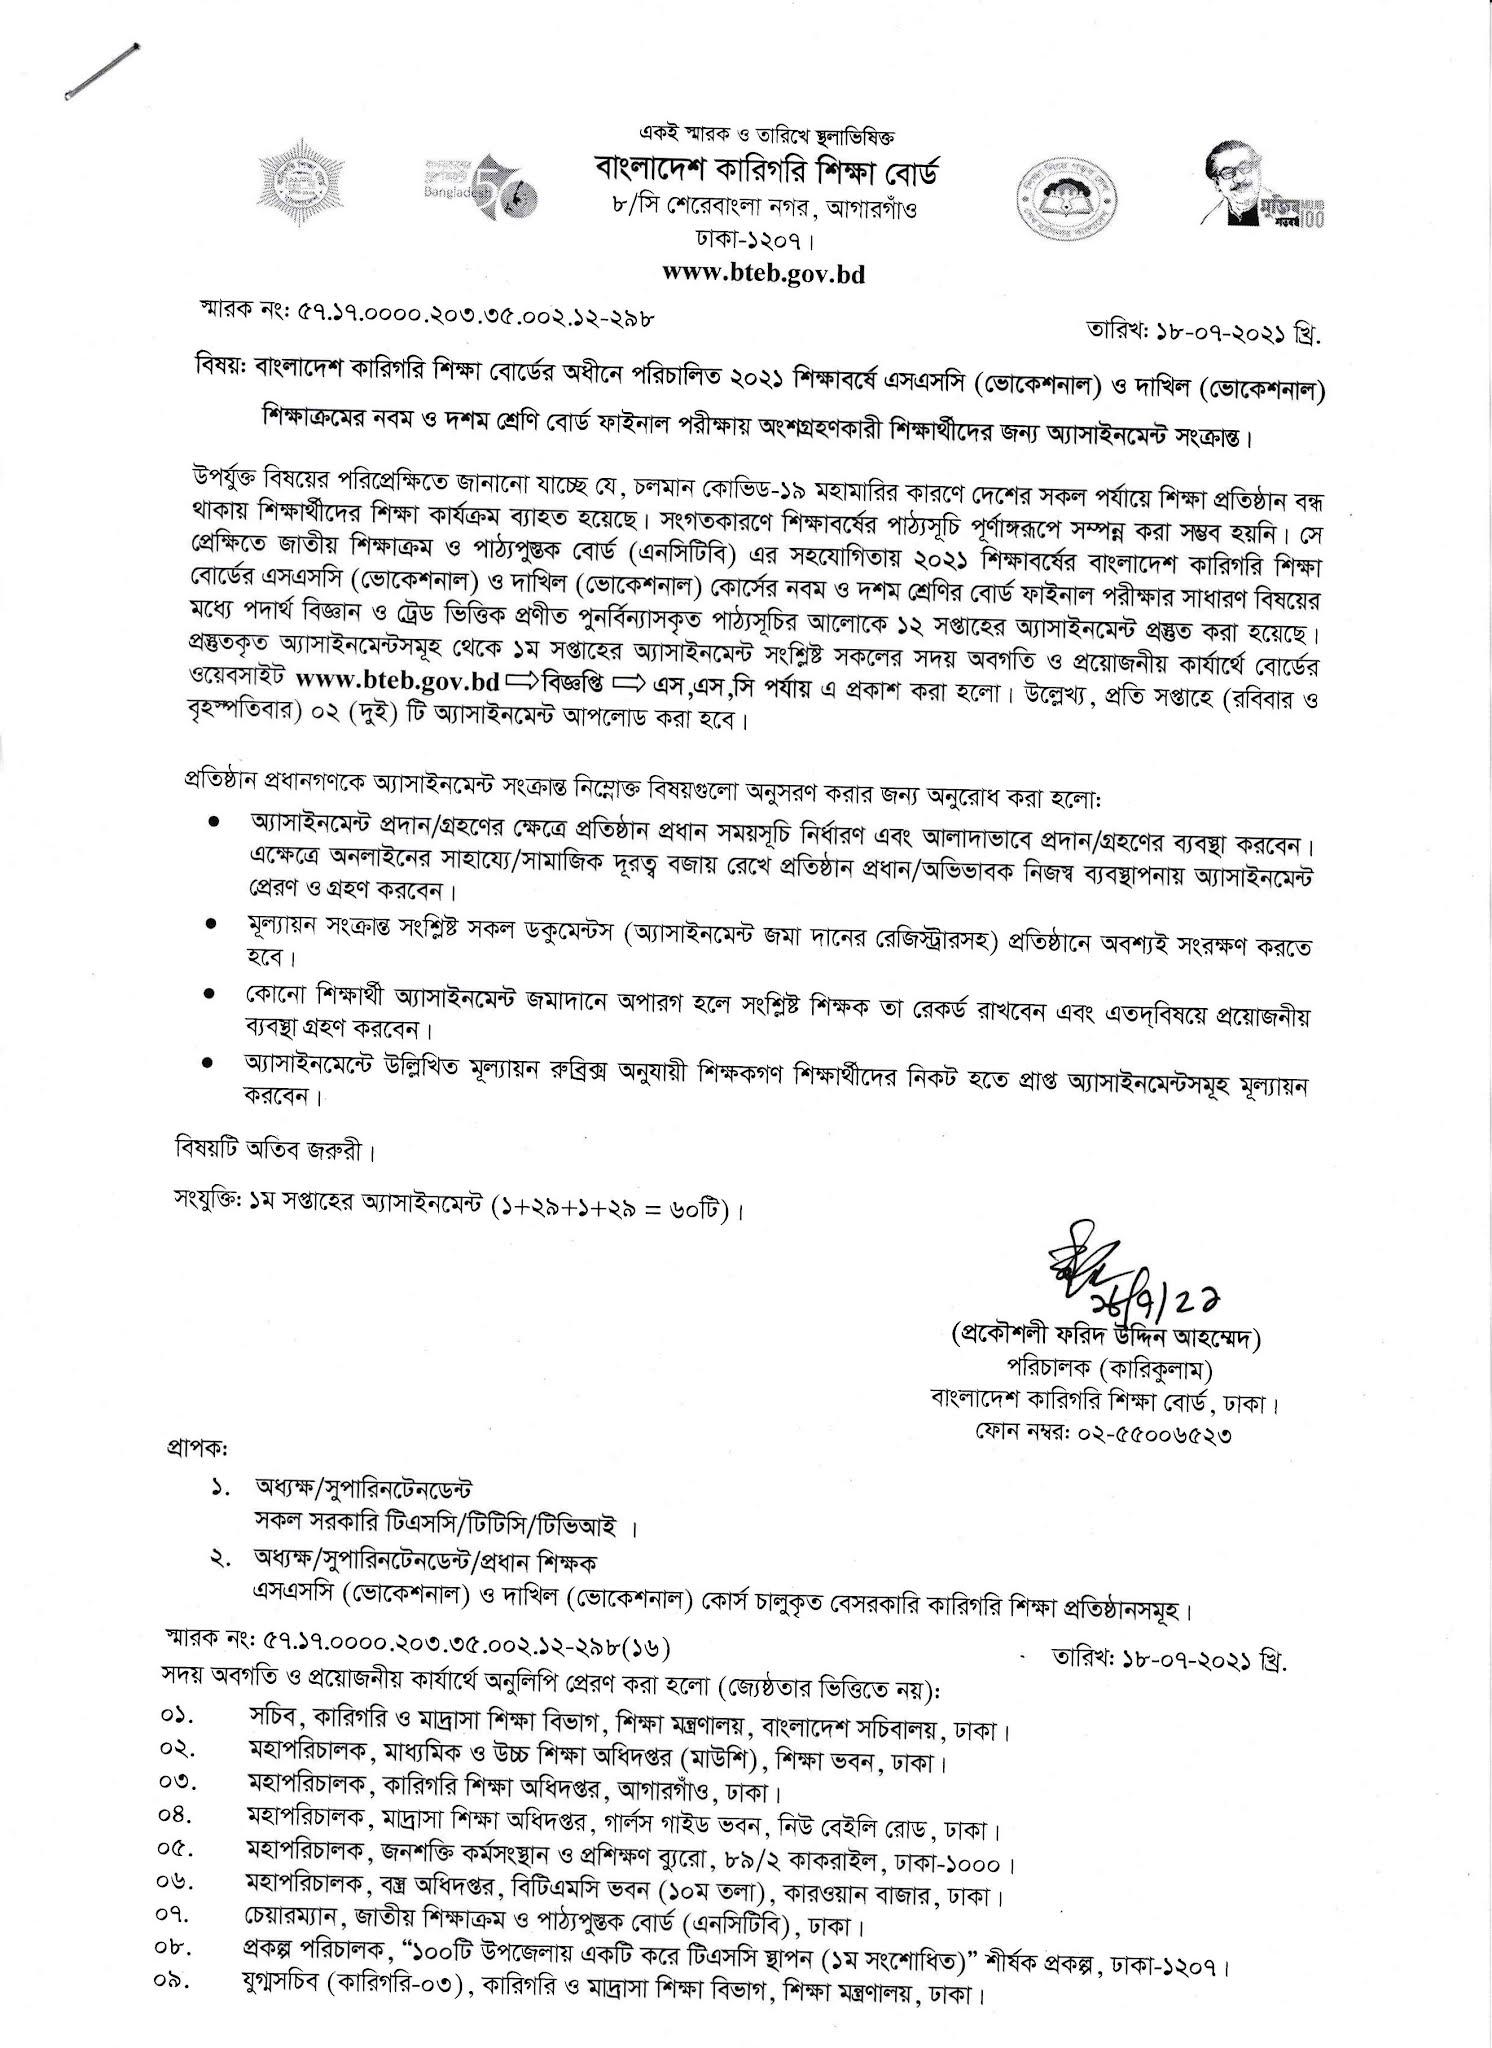 SSC / Dakhil (Vocational) 9th-10th class assignment solution / Answer 2021 3rd week